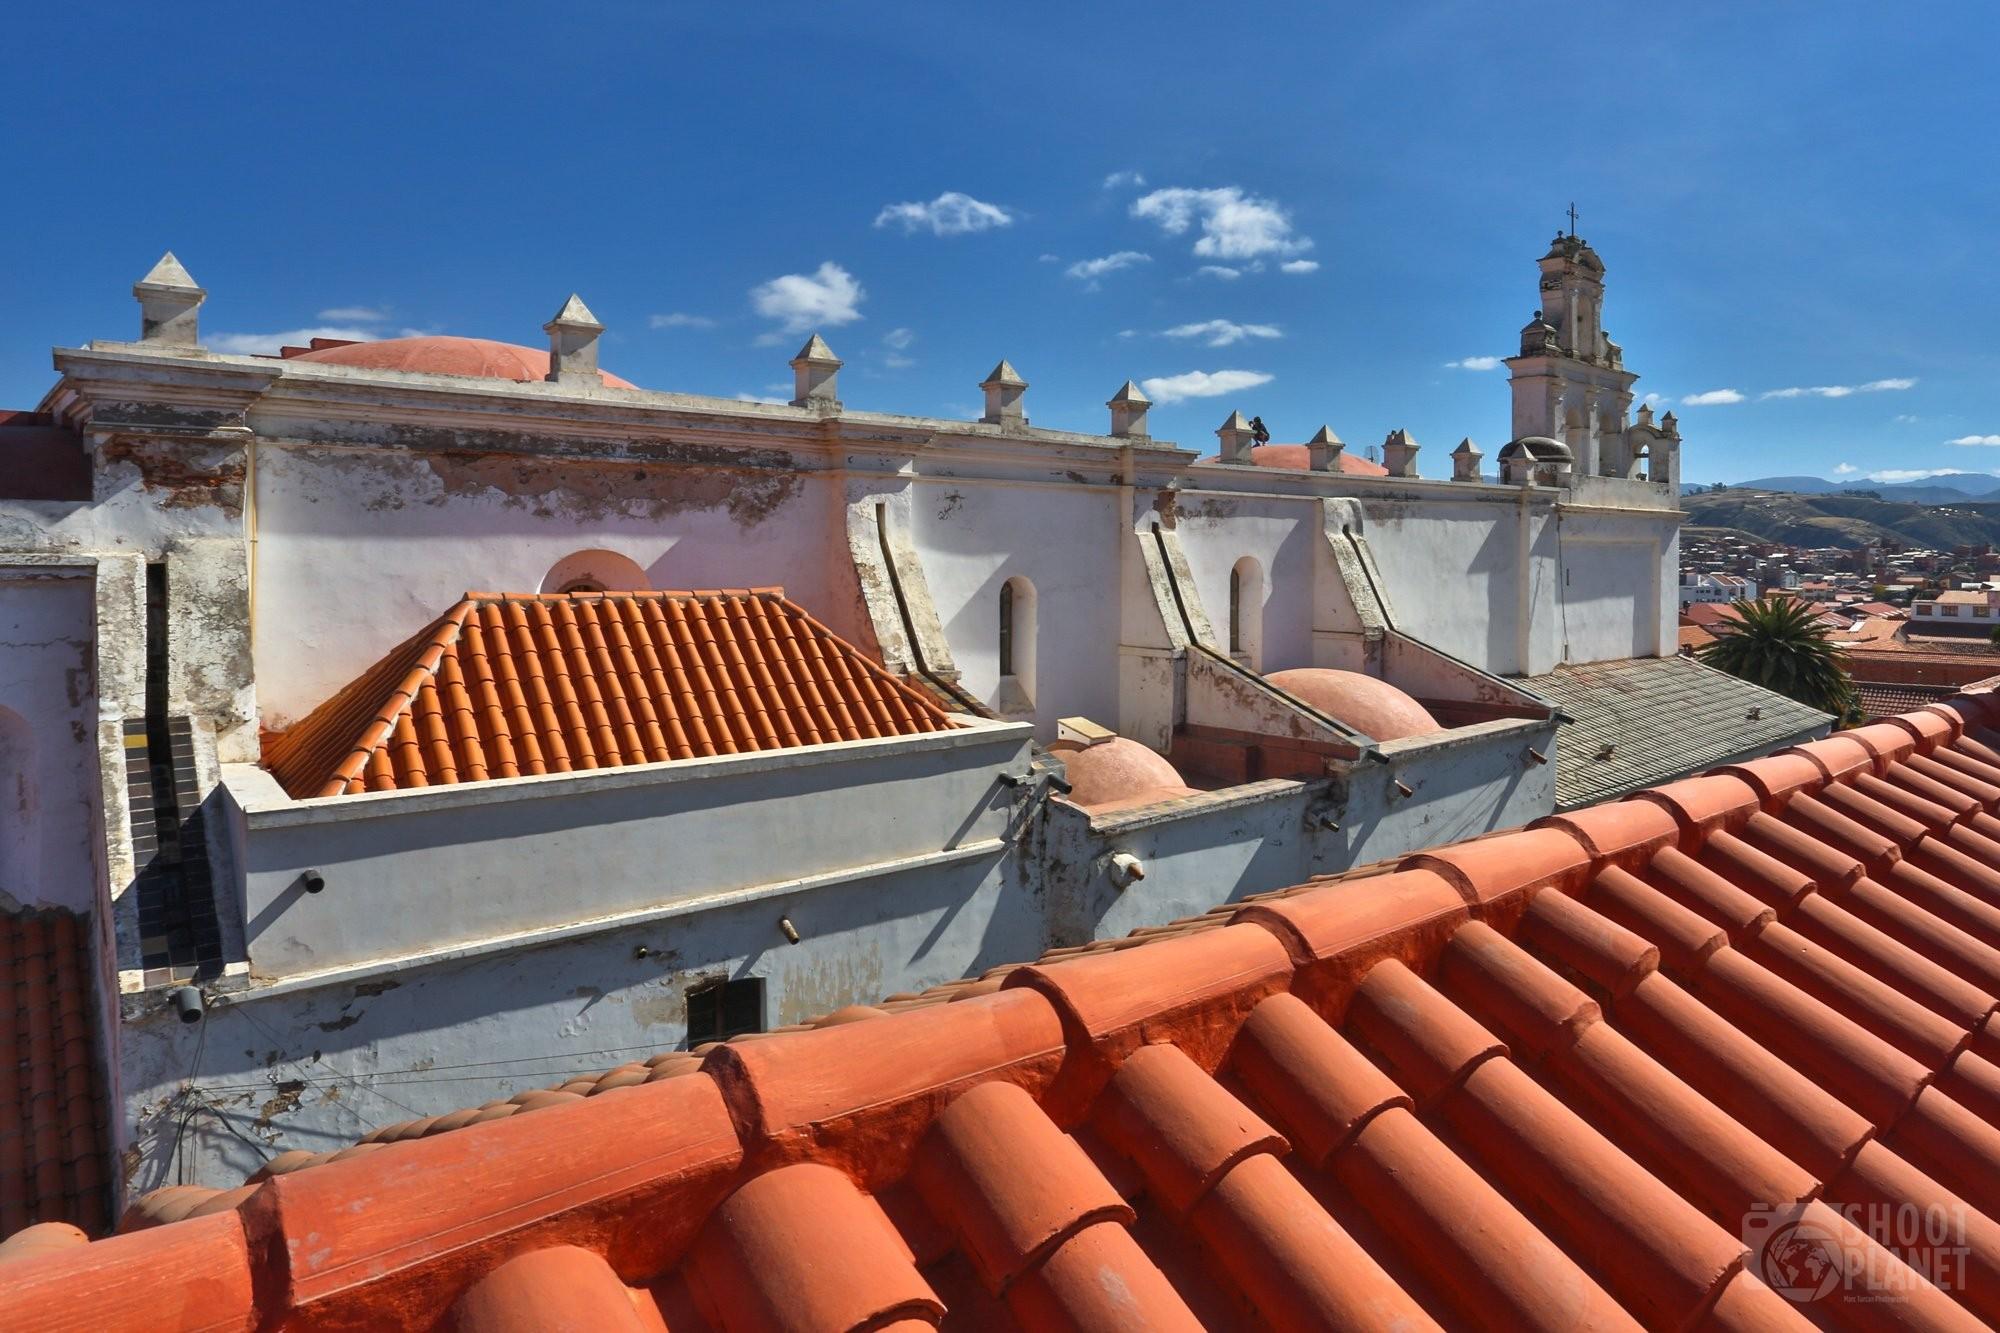 La Merced Church skyline, Sucre Bolivia